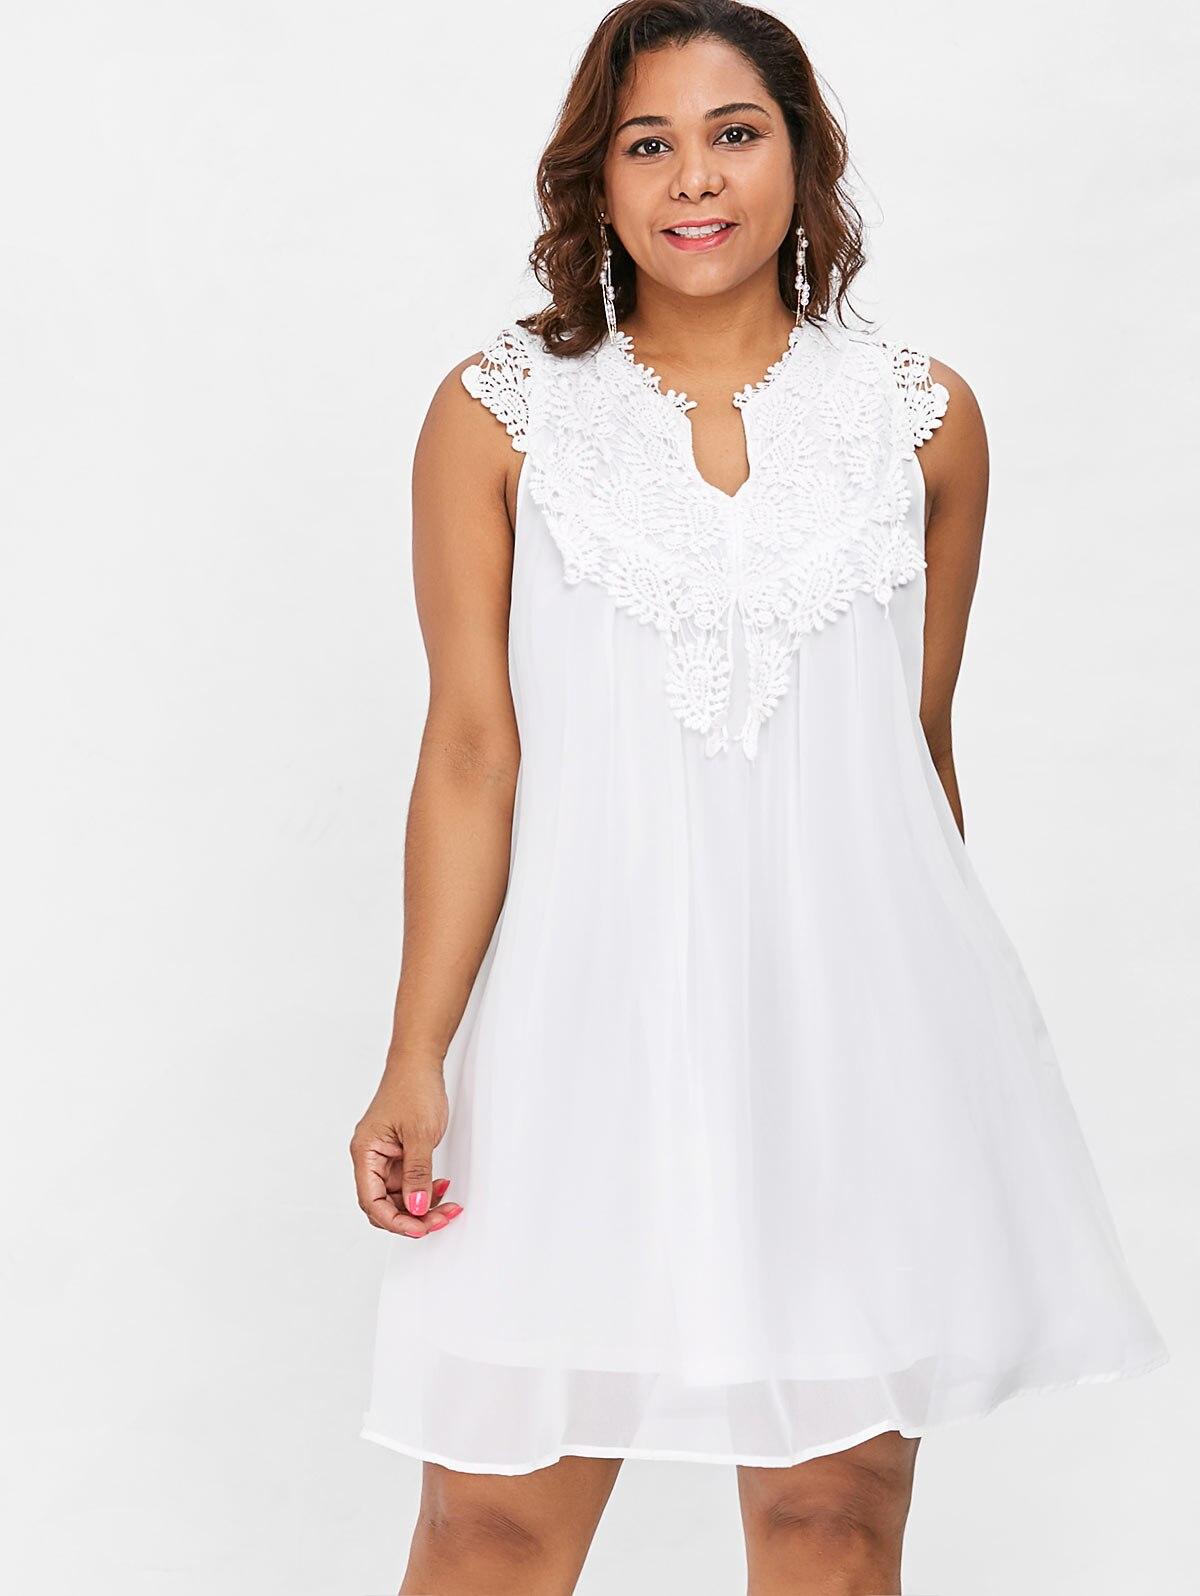 Wipalo Plus Size Crochet Panel Babydoll Dress Women V-Neck Hollow Out Lace  Spliced Mini A Line Chiffon Dress Vestidos 5XL